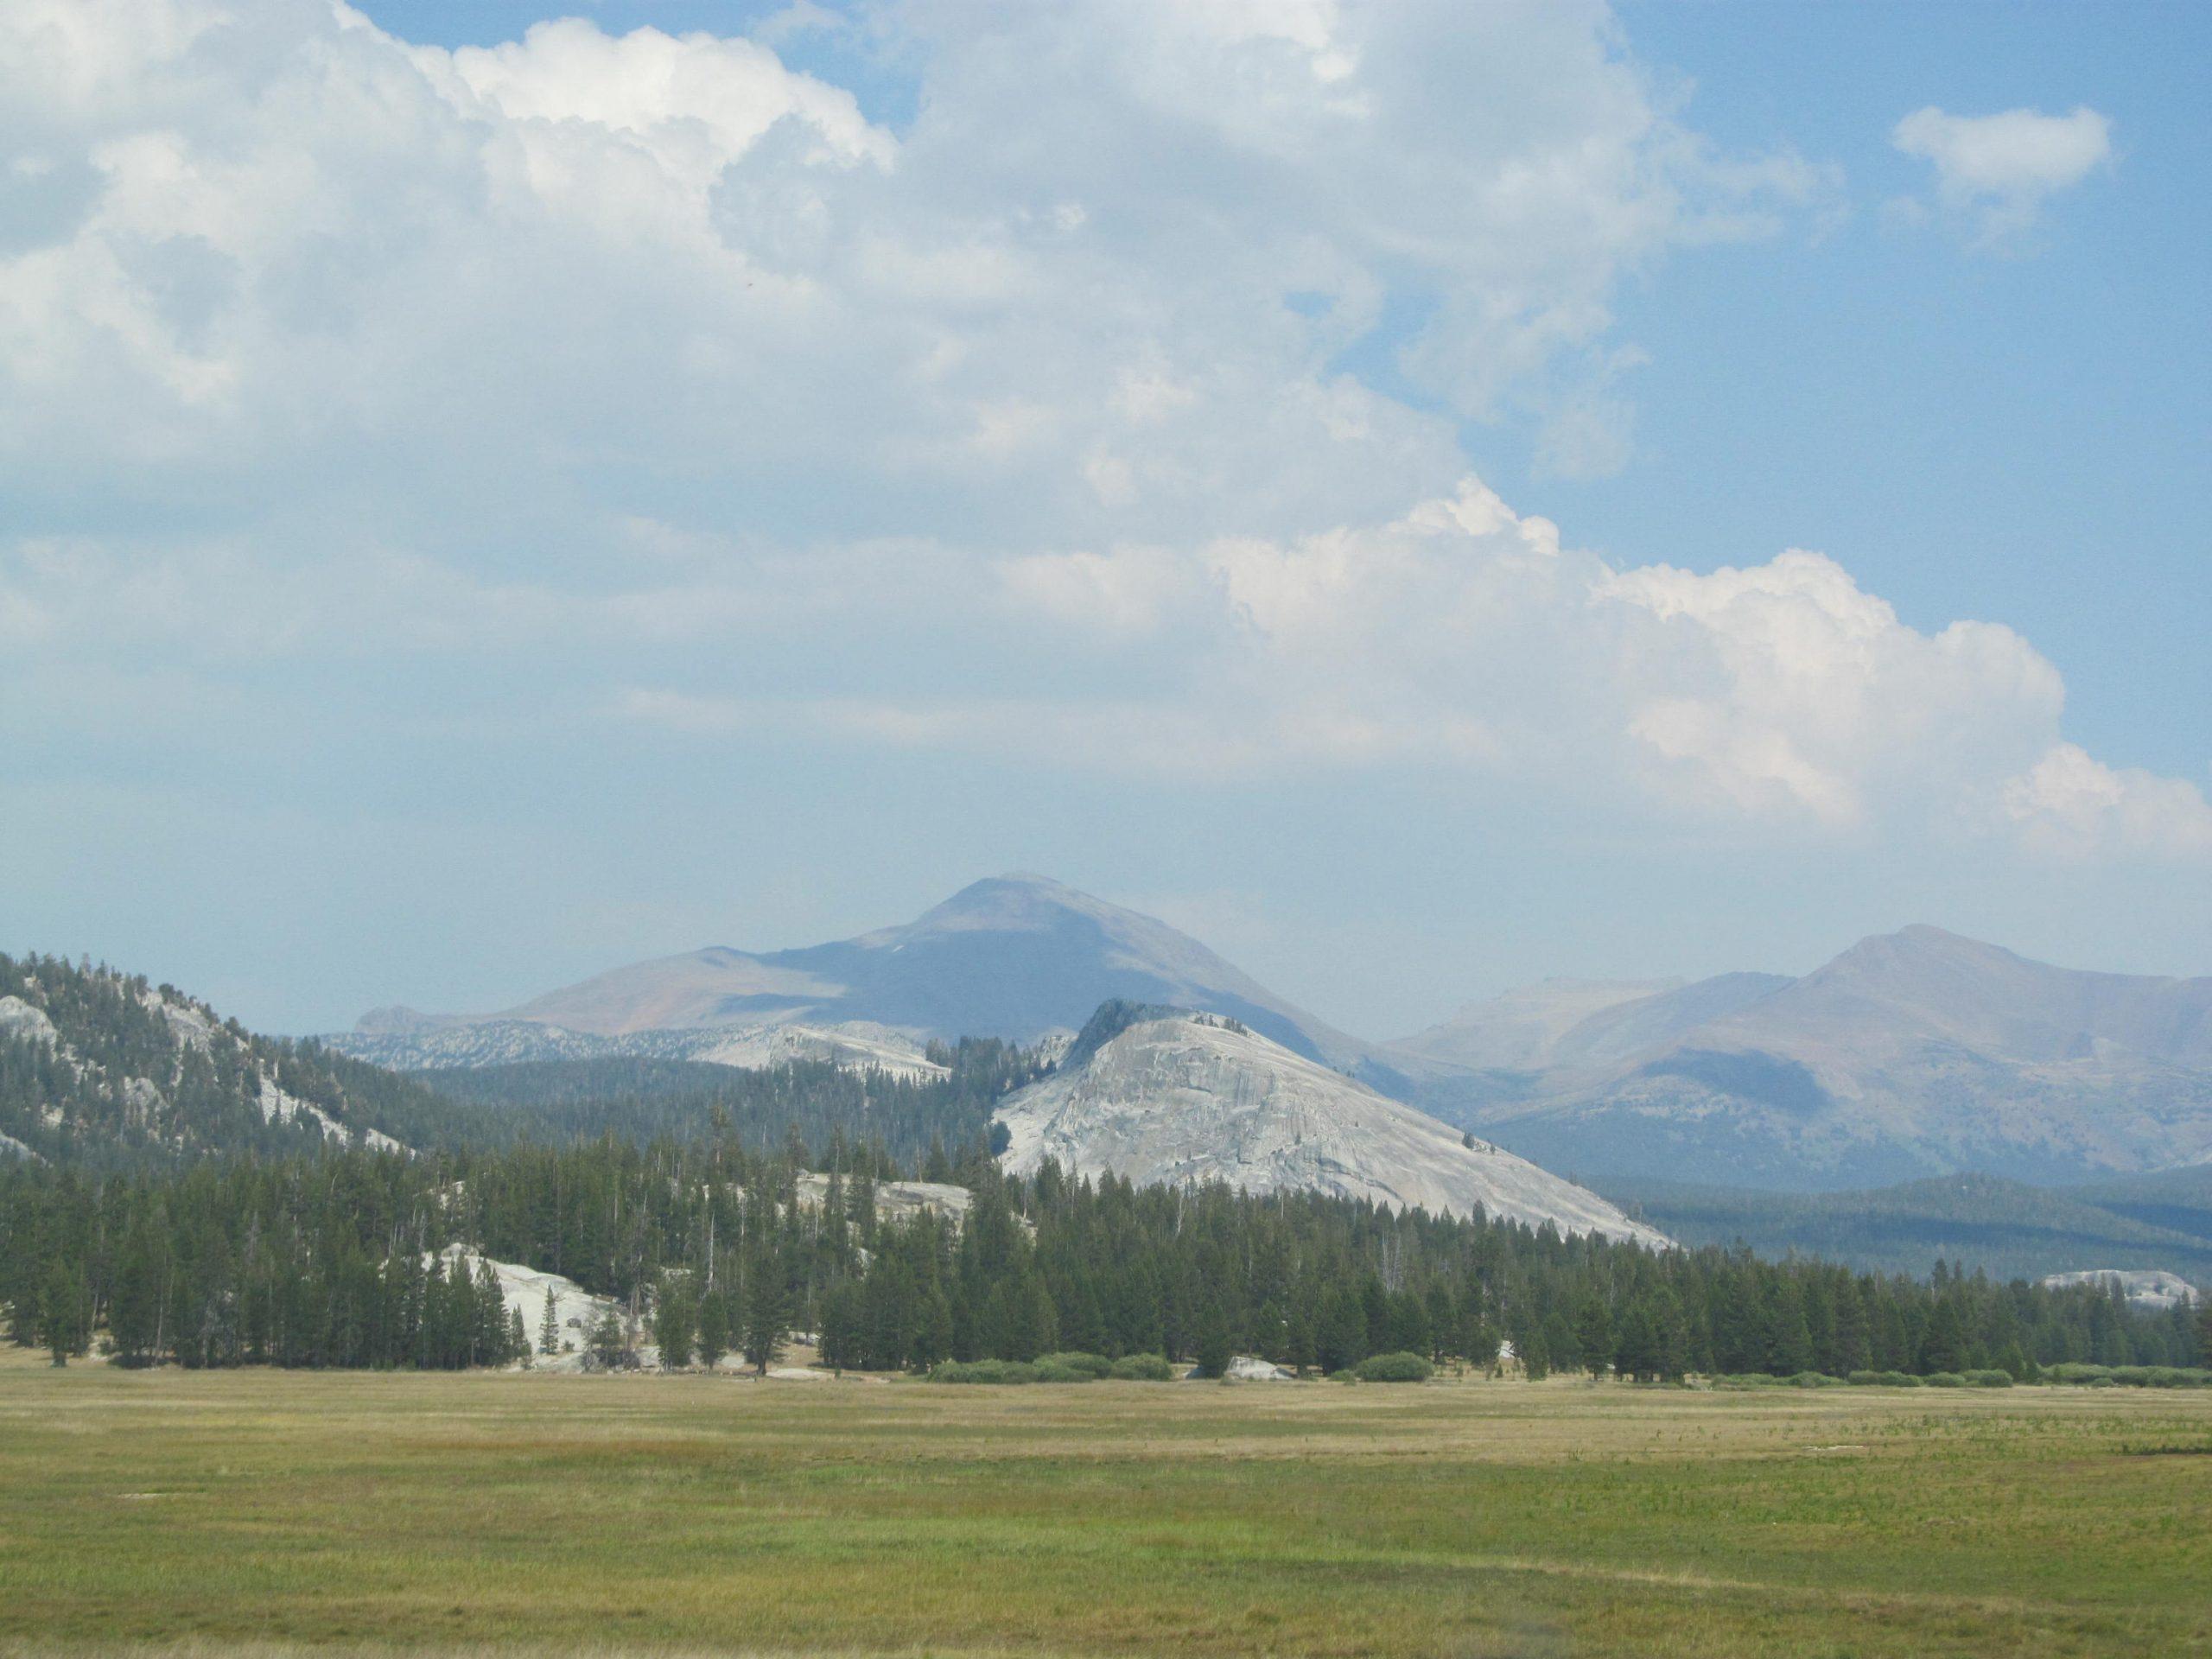 Inside Yosemite